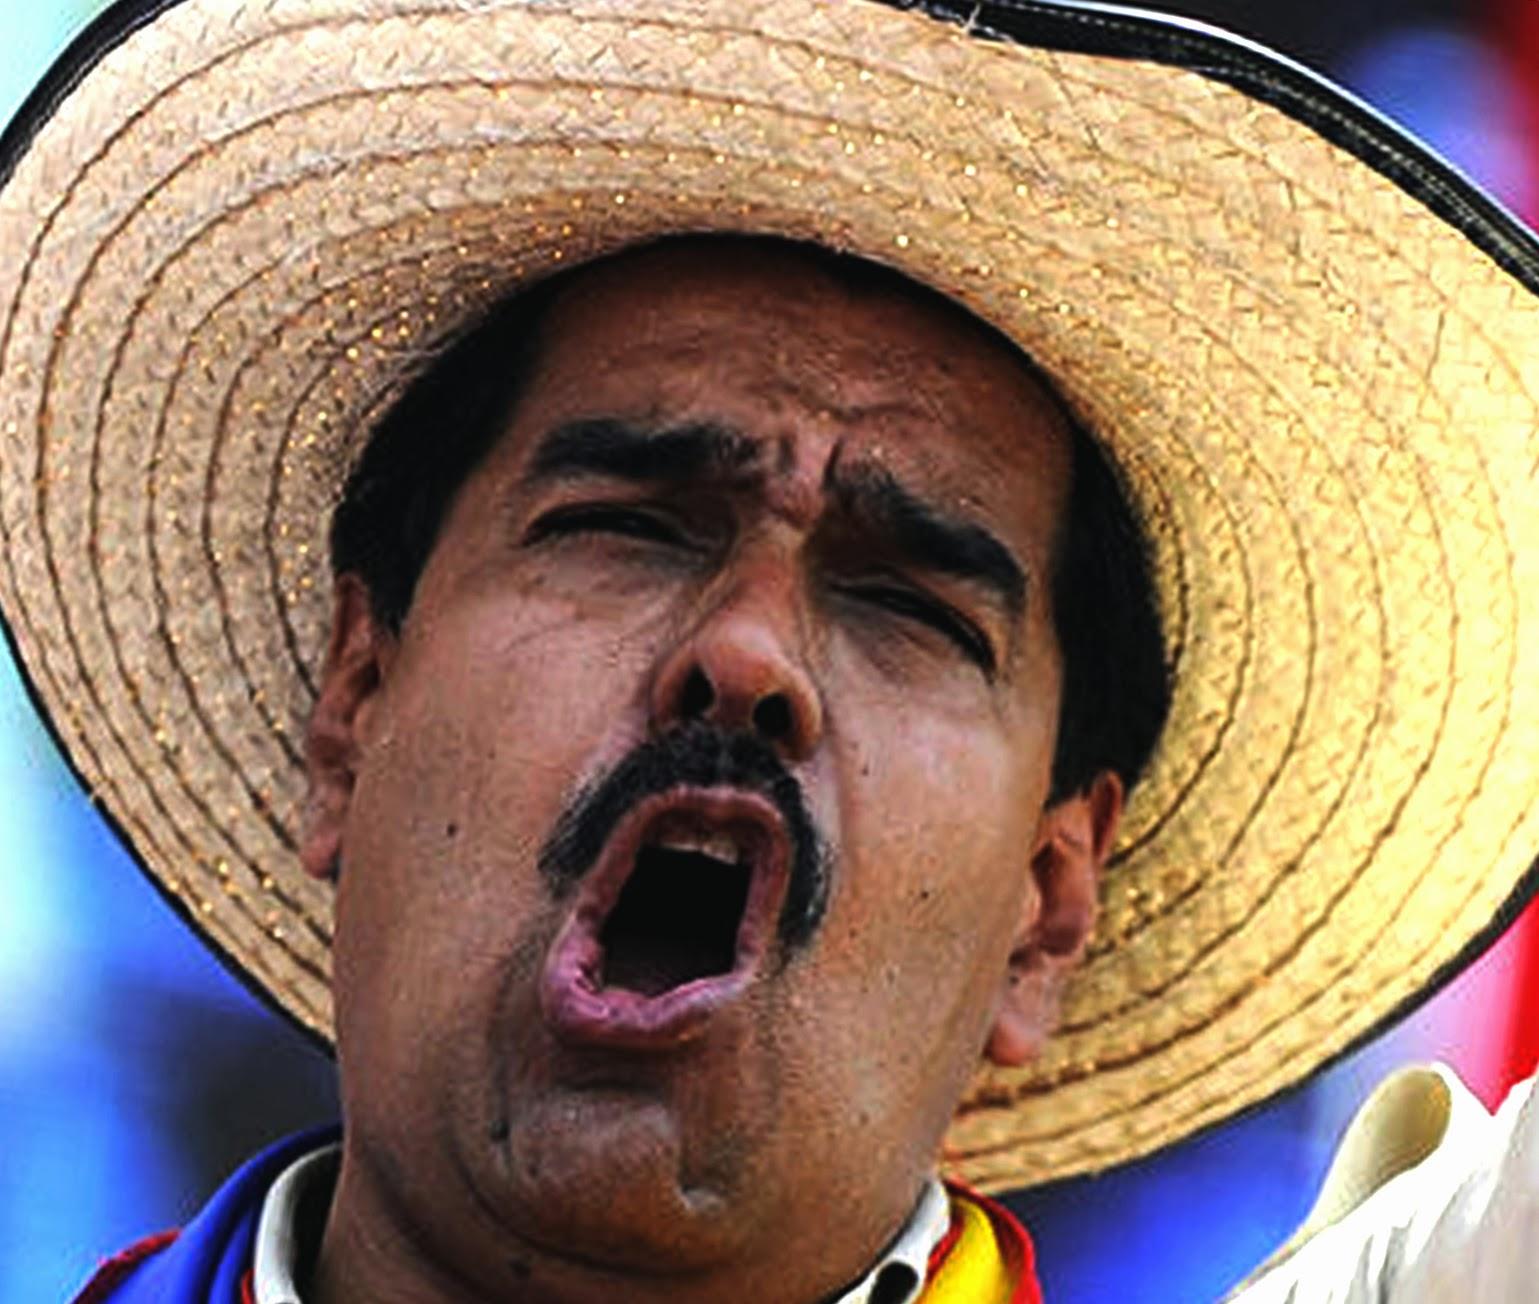 http://3.bp.blogspot.com/-N2P8R3nur6I/UmtFLi8vGTI/AAAAAAAAVws/Pbf7N4ztFlI/s1600/internacional-venezuela-eleicoes-presidenciais-maduro-20130404-01-size-598.jpg